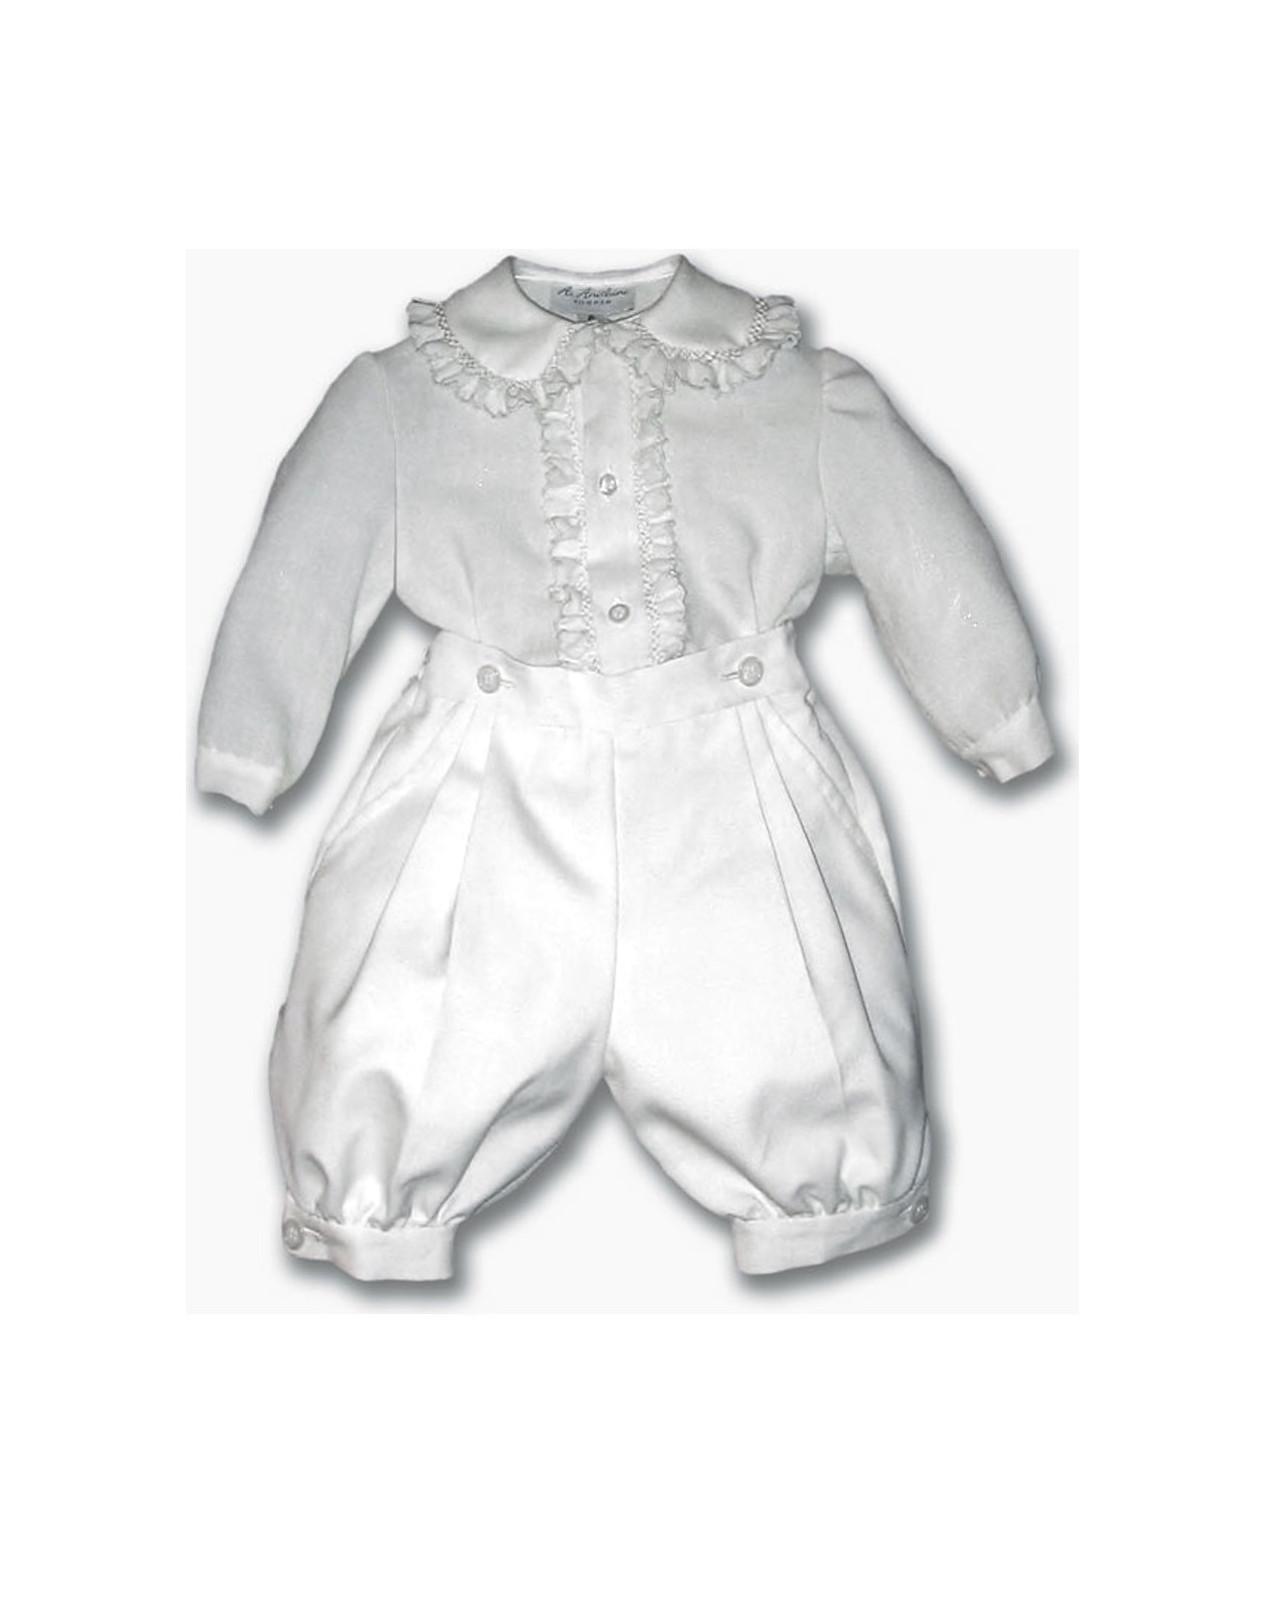 RICCARDO boy christening outfit